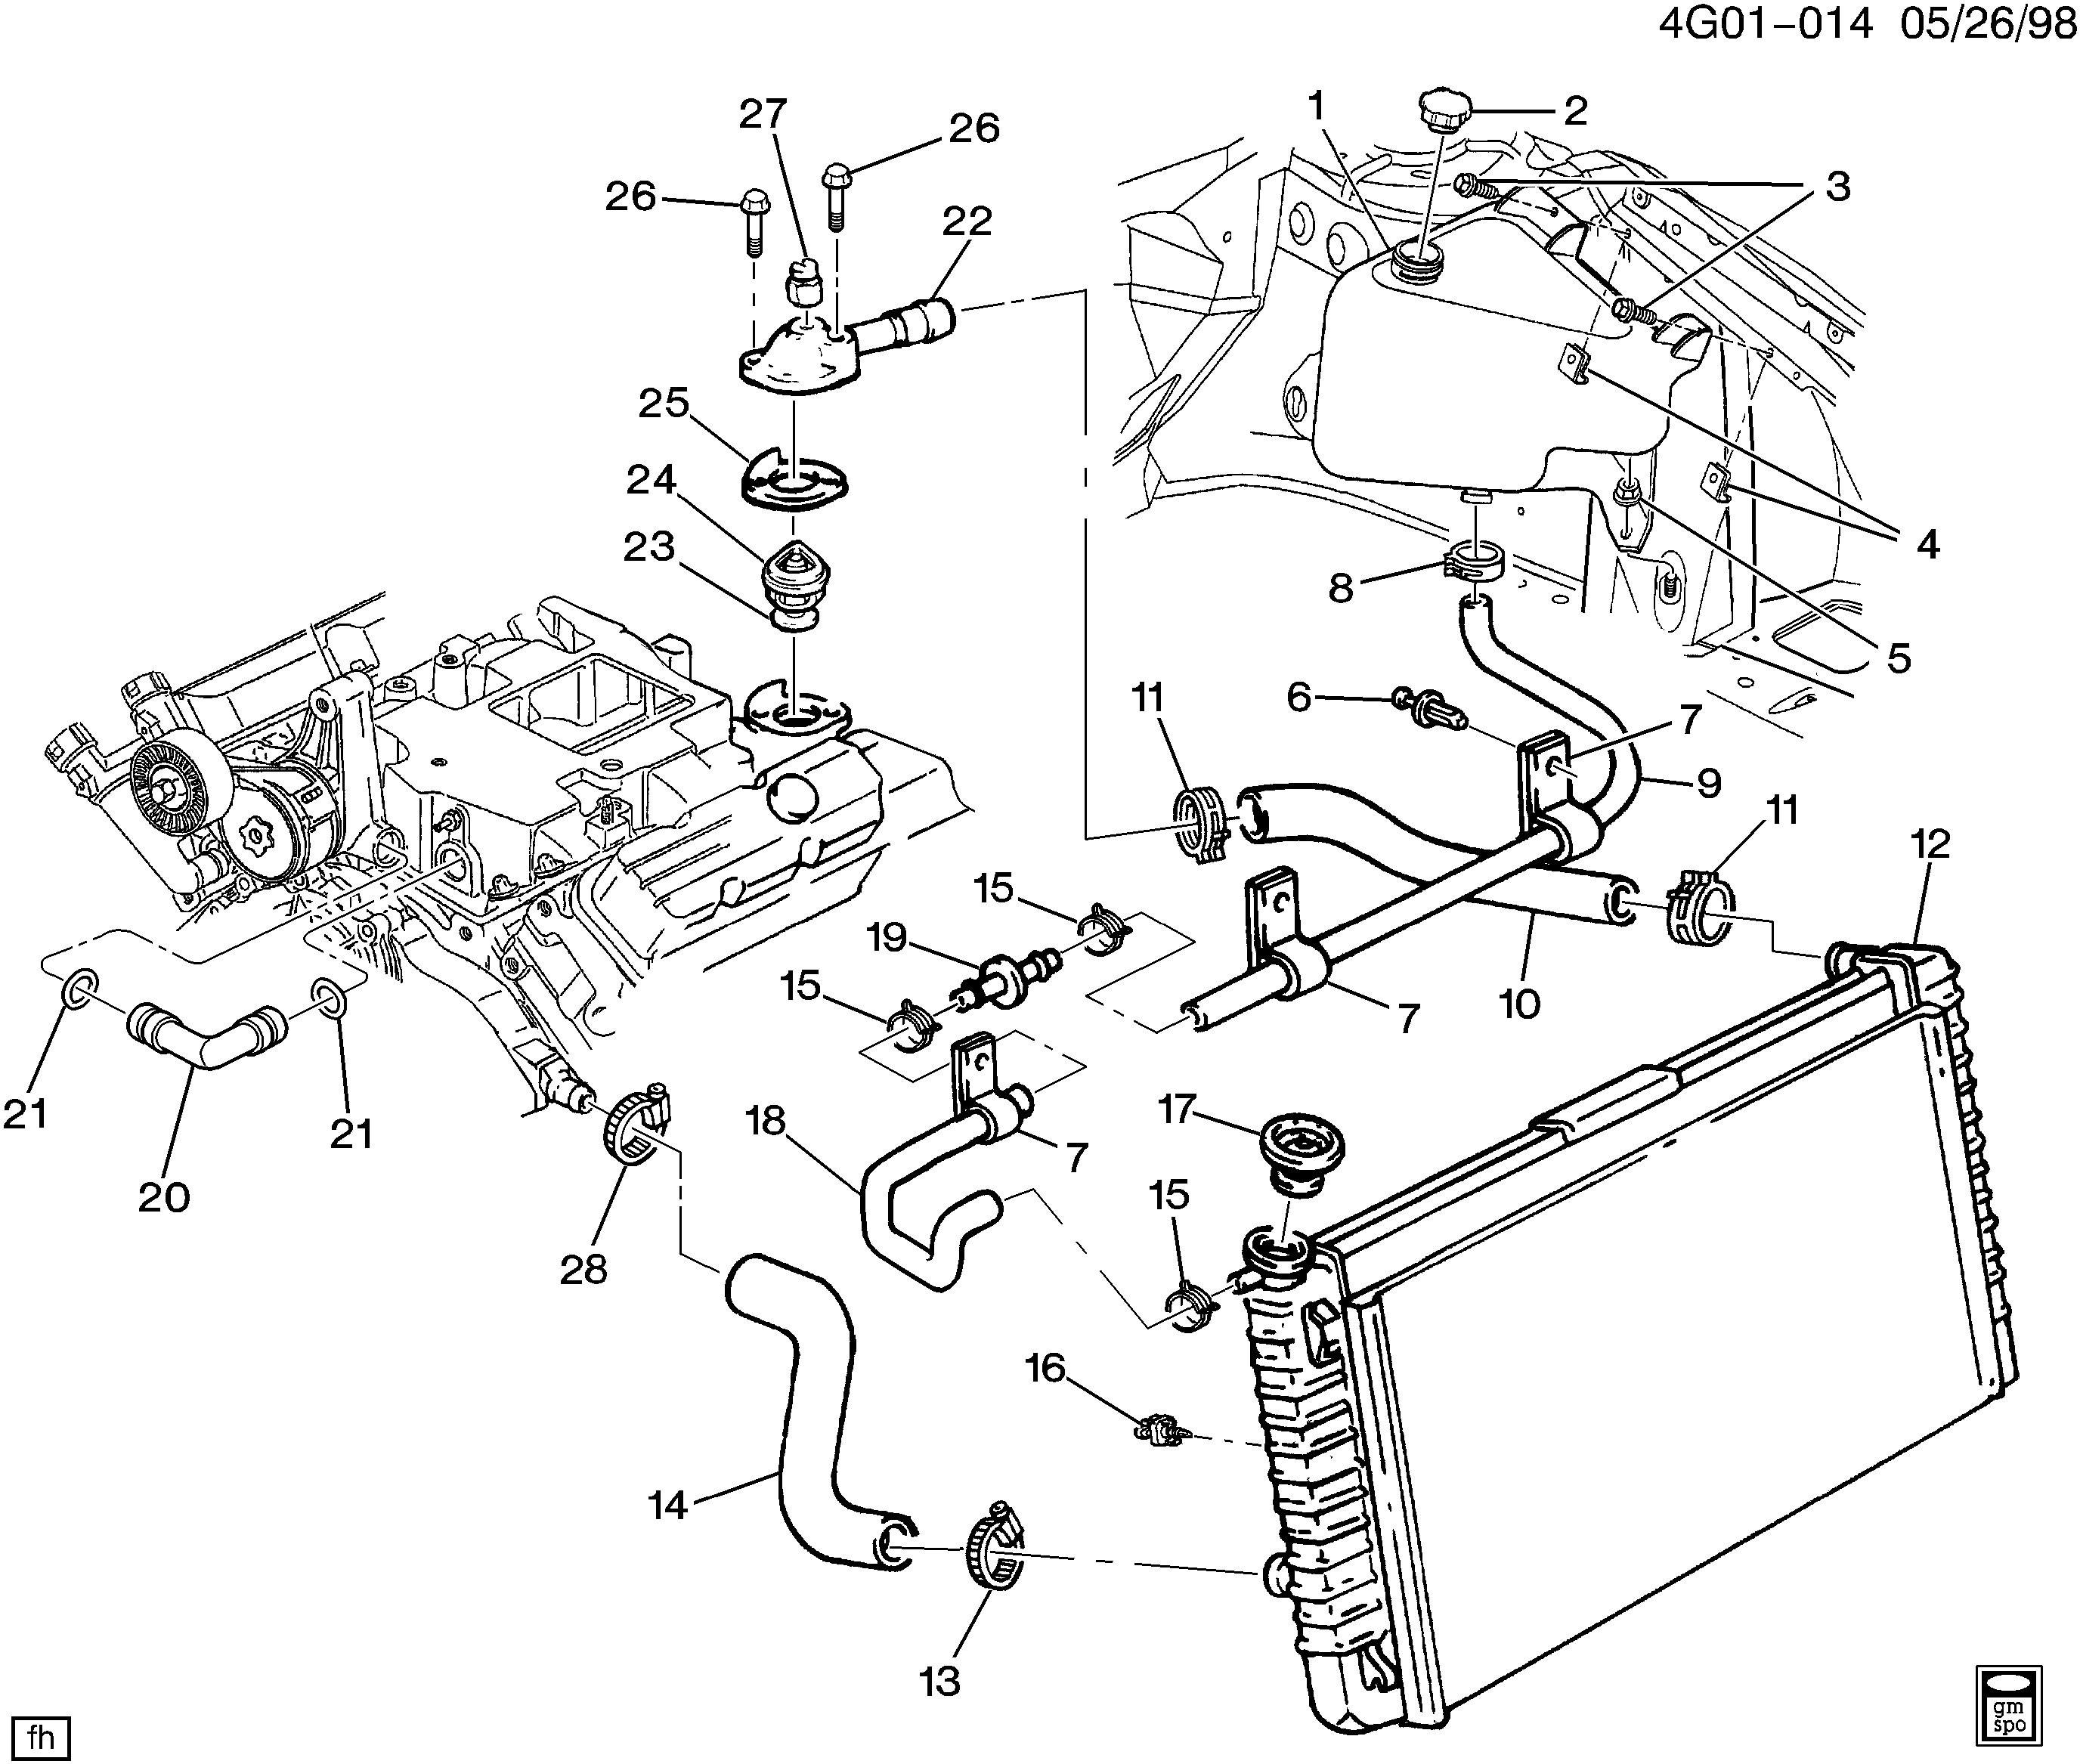 Diagram On Pontiac Bonneville 3800 Engine Diagram Get Free Image